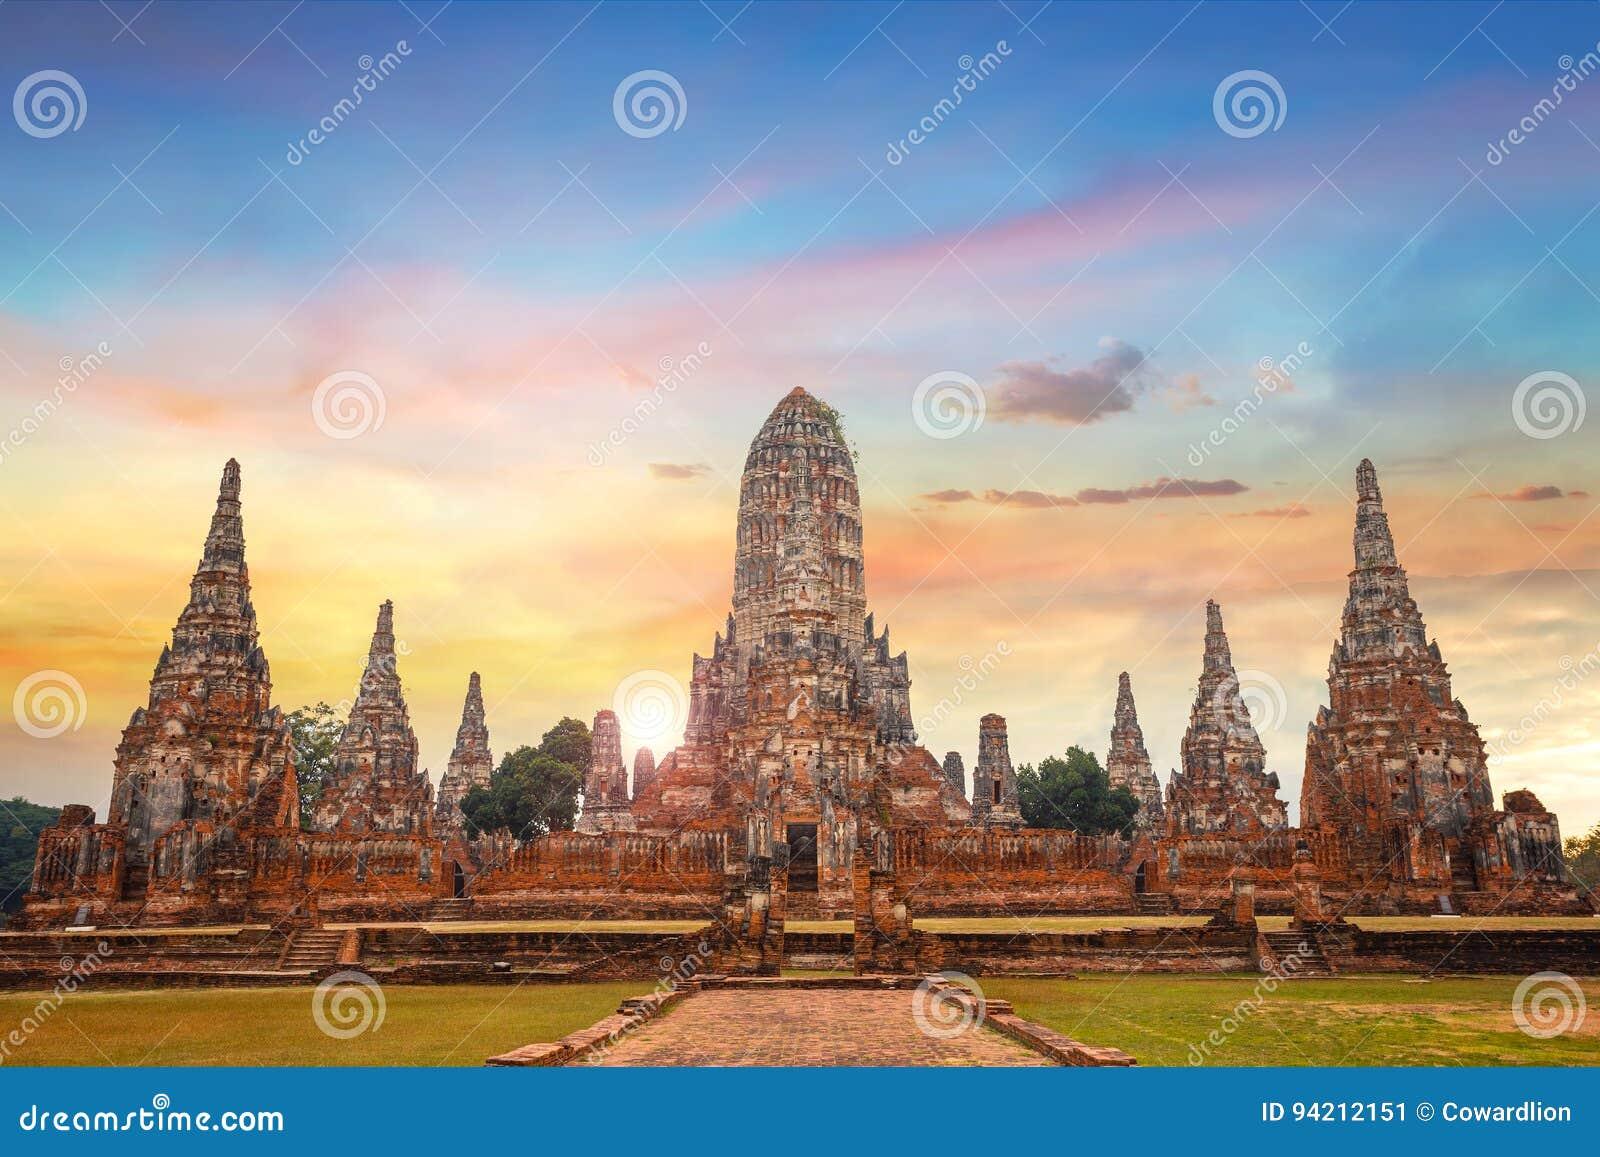 Wat Chaiwatthanaram temple in Ayuthaya Historical Park, Thailand